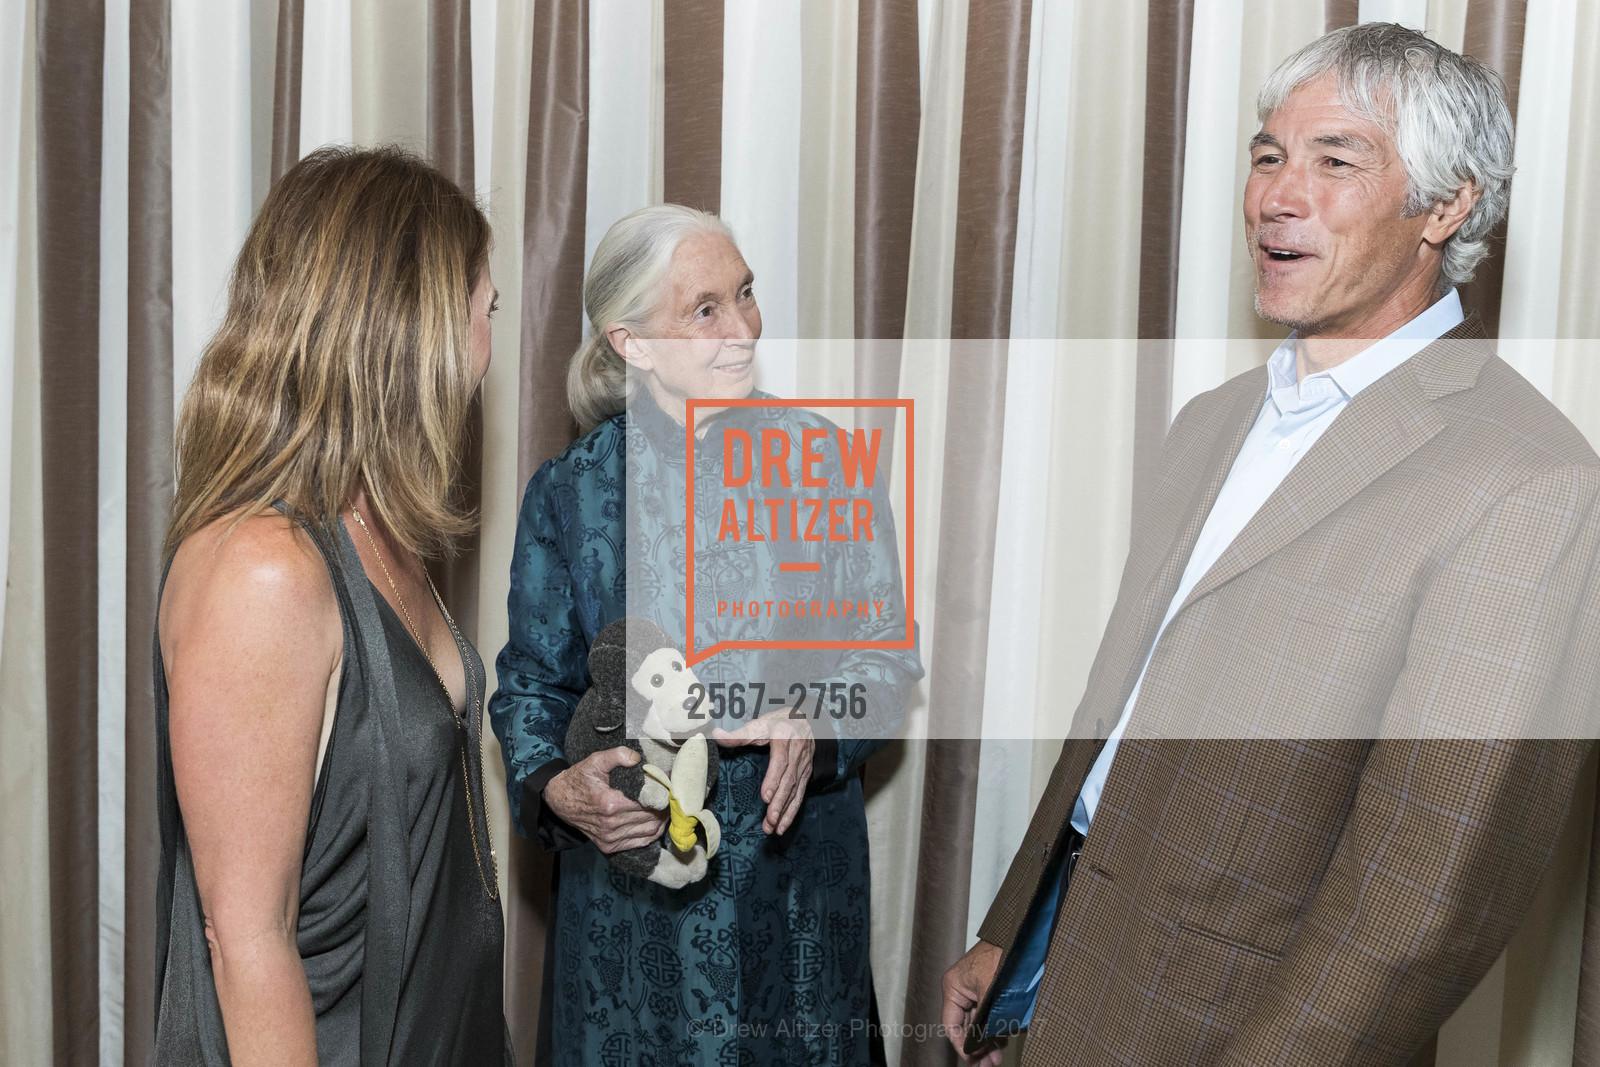 Kristin Coates, Jane Goodall, Morgan Guenther, Photo #2567-2756